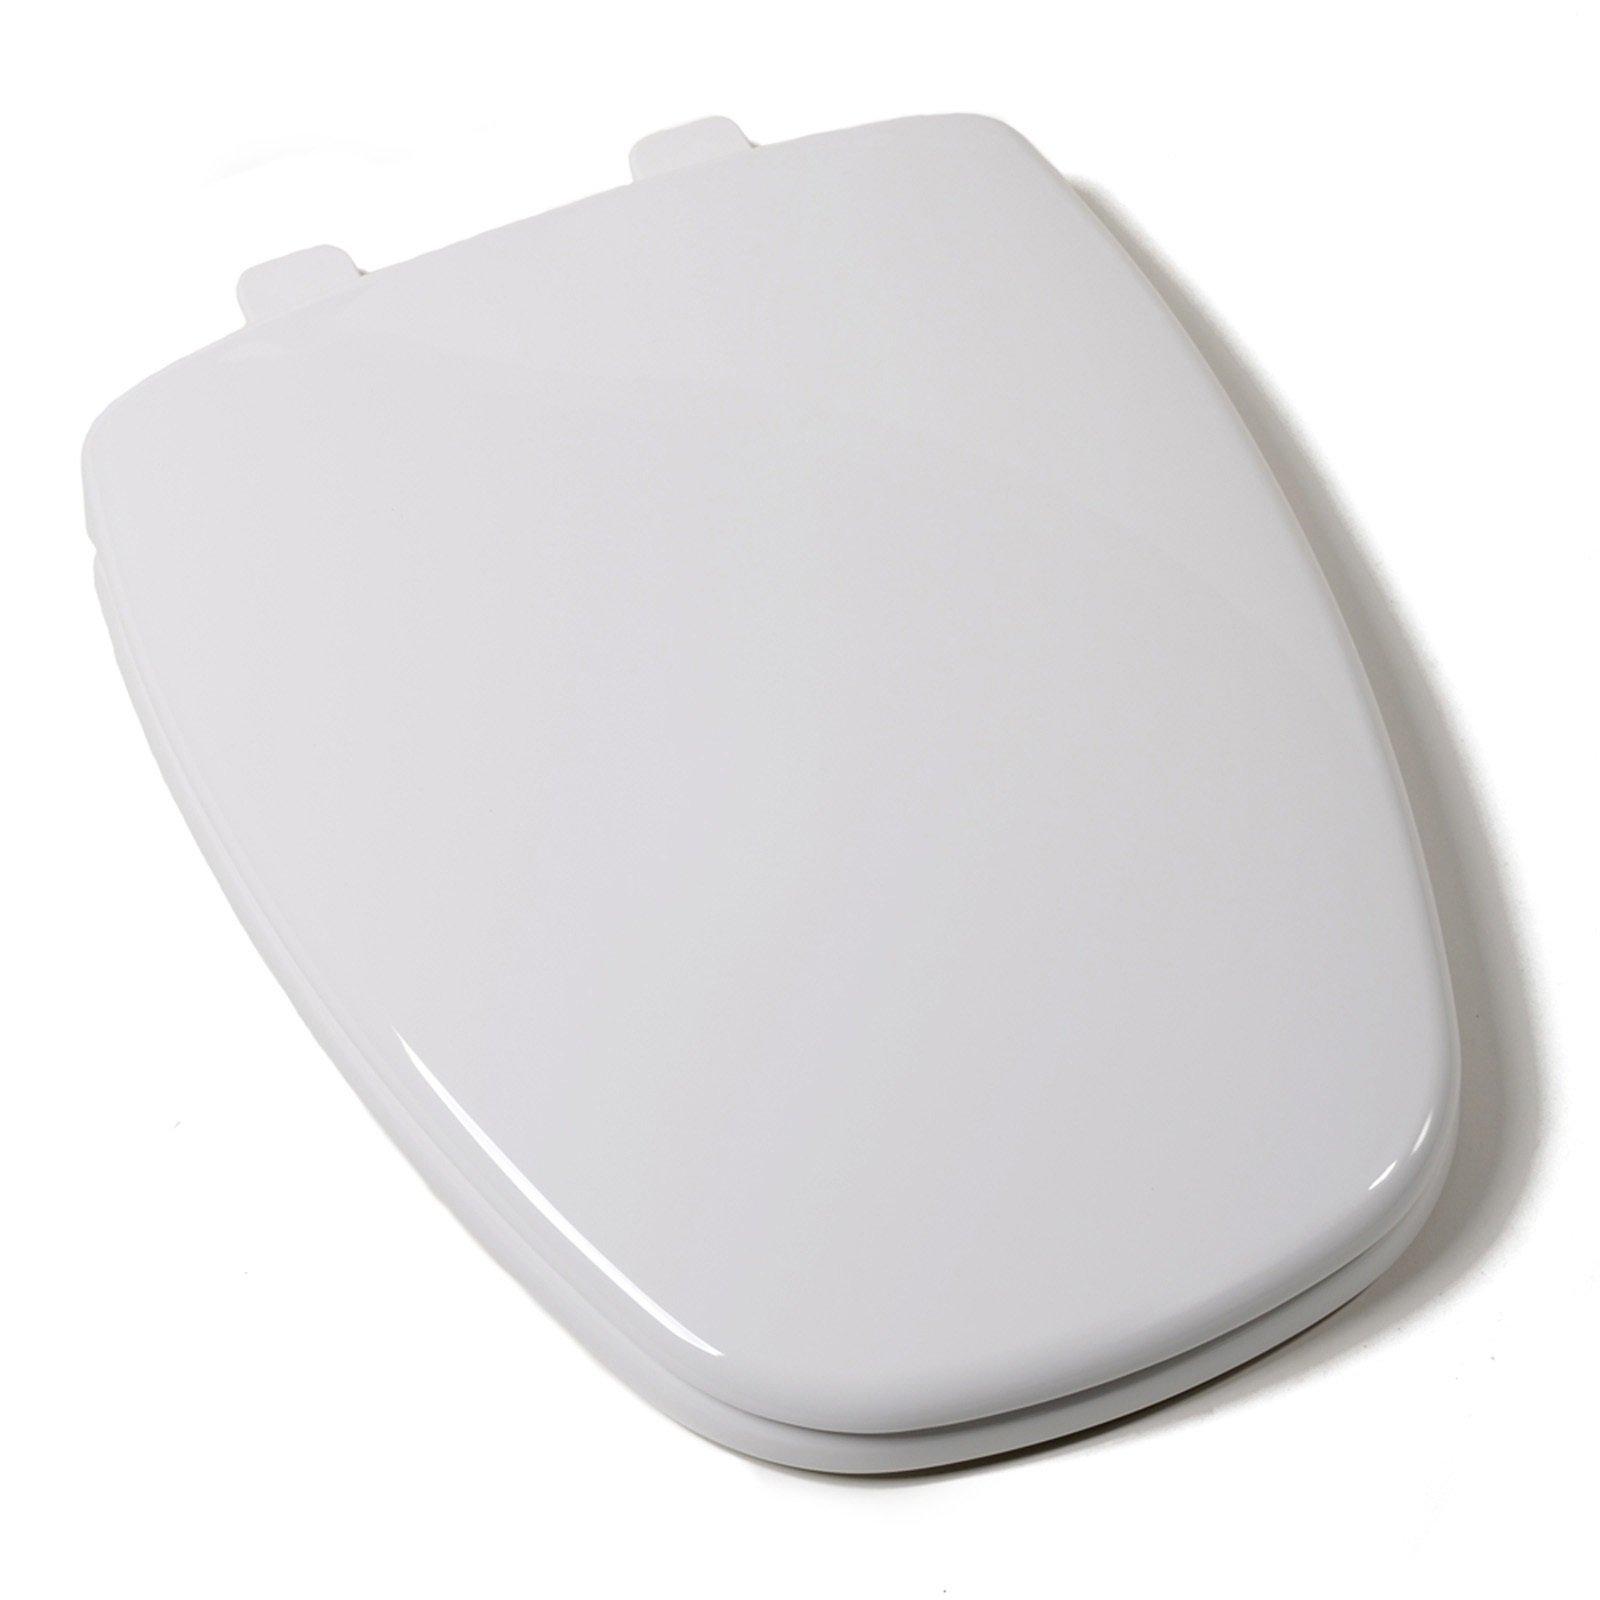 Bath Décor 2F1E11-00 Top Mount Square Front Residential Elongated Plastic Toilet Seat for Eljer New Emblem